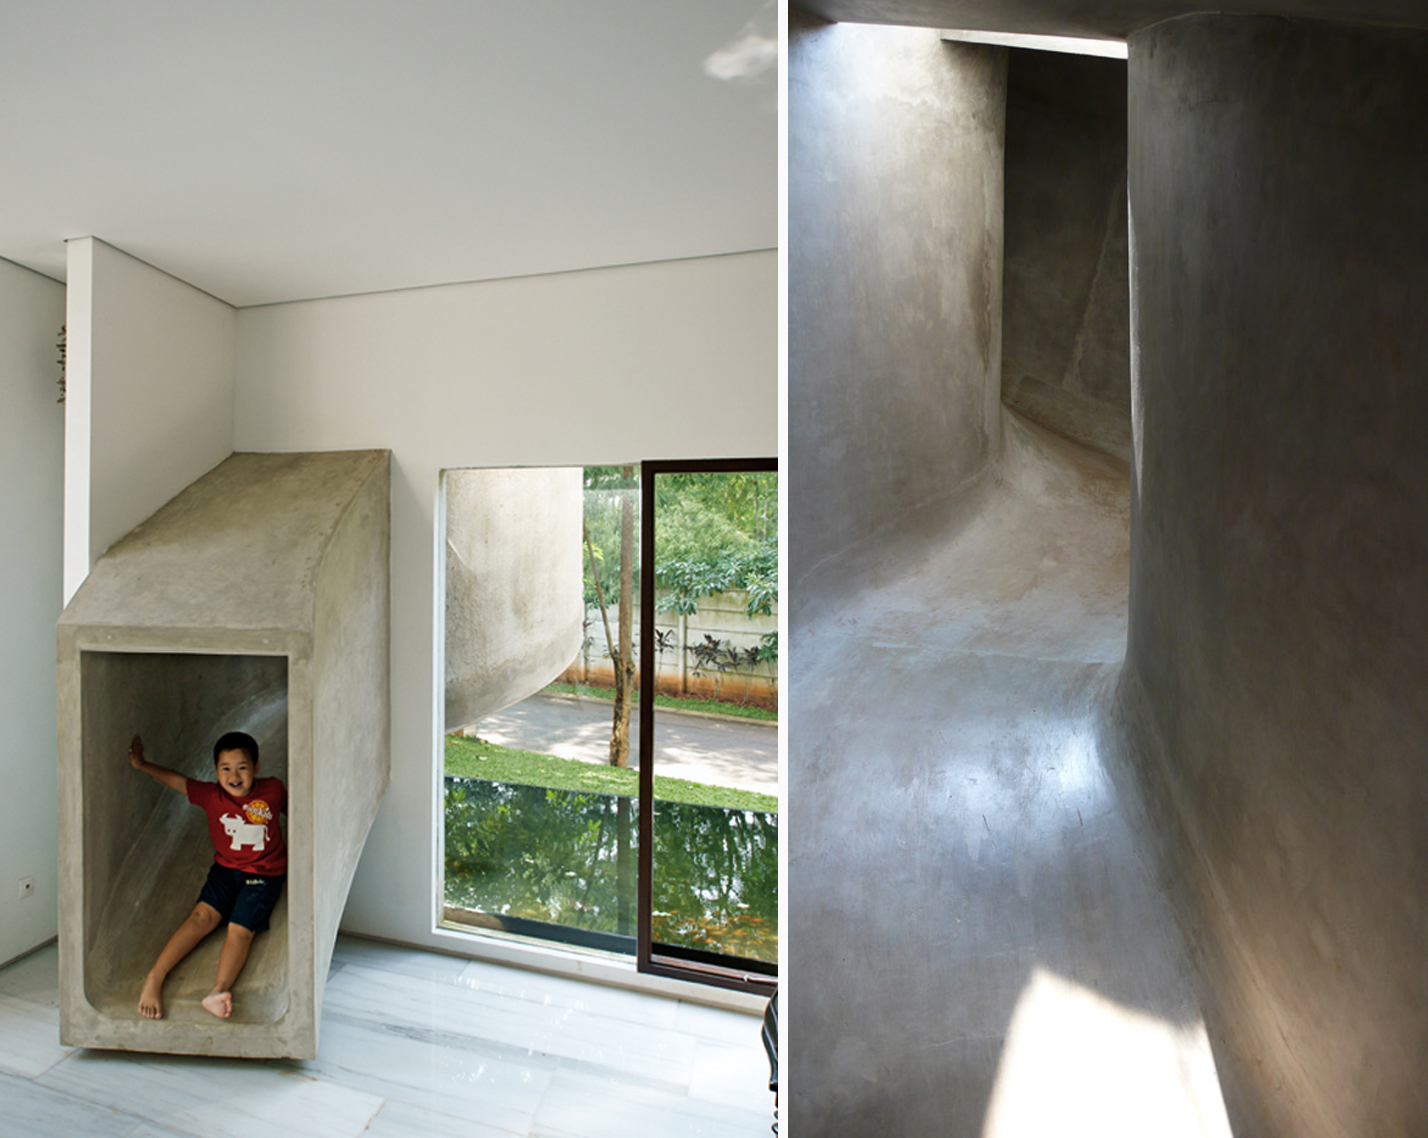 Daniel Paya Dise 241 O De Interiores Arquitectura Y Decoraci 243 N Madrid Blog Escalera O Tobog 225 N